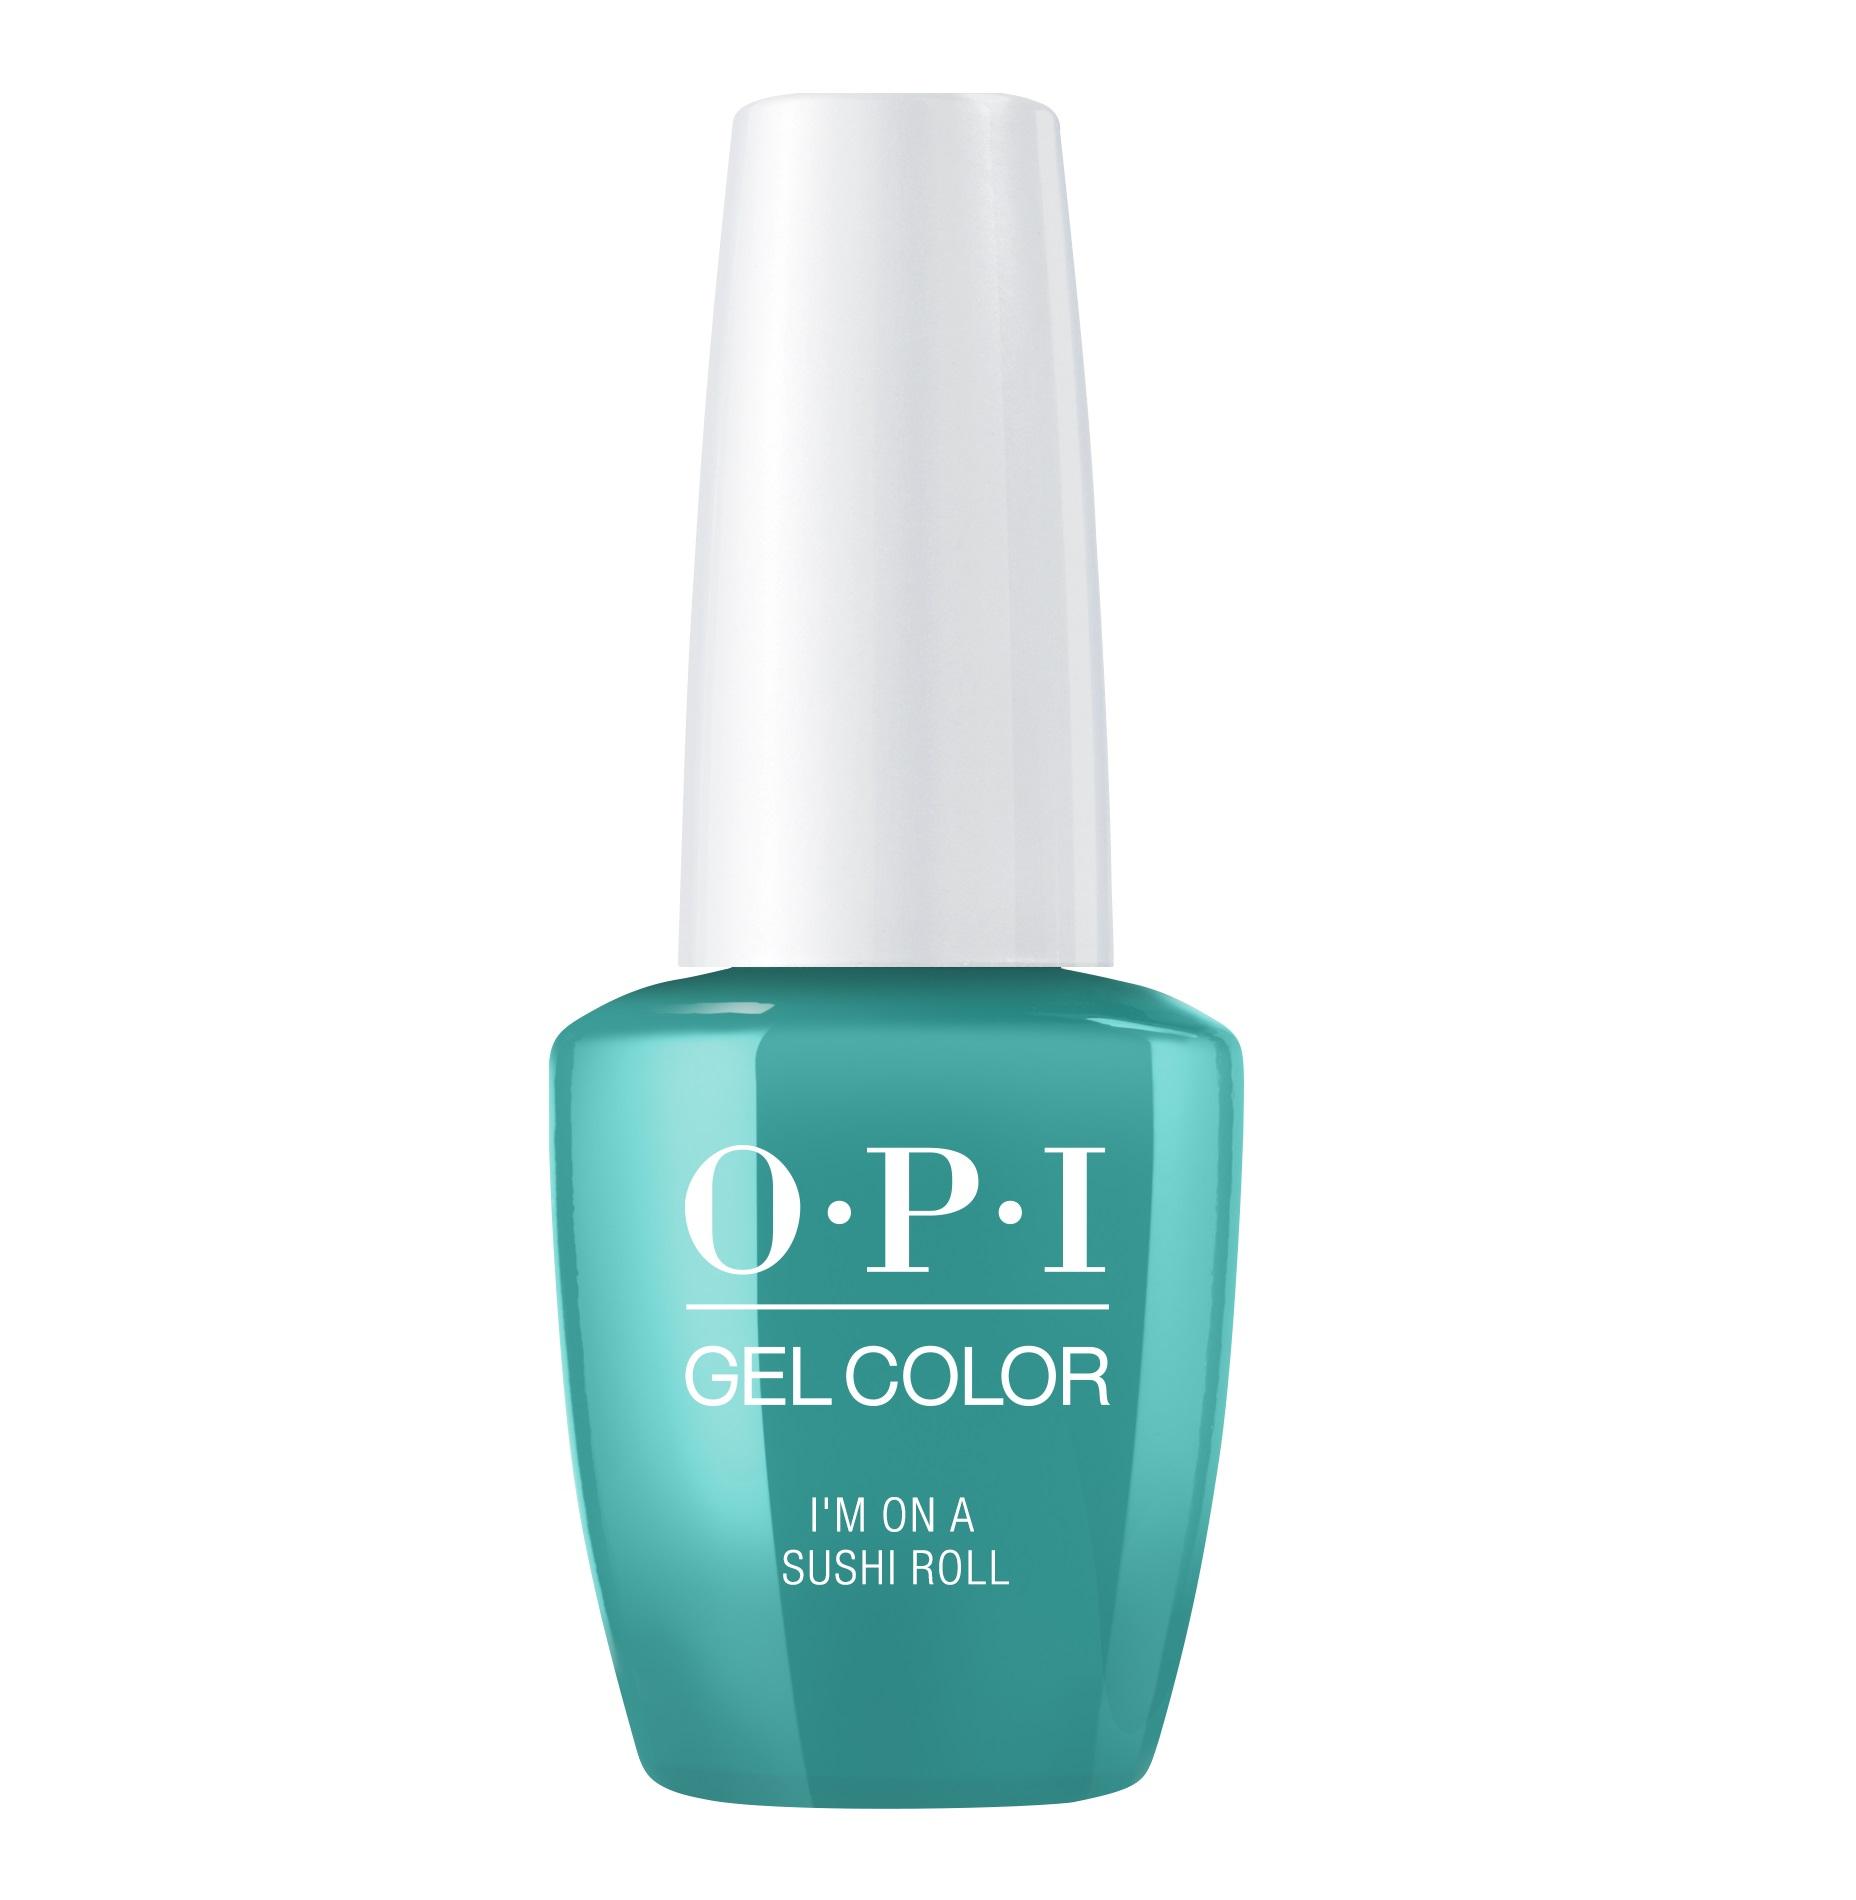 OPI Гель-лак для ногтей / Im Ona Sushi Roll Gel Color 15 мл